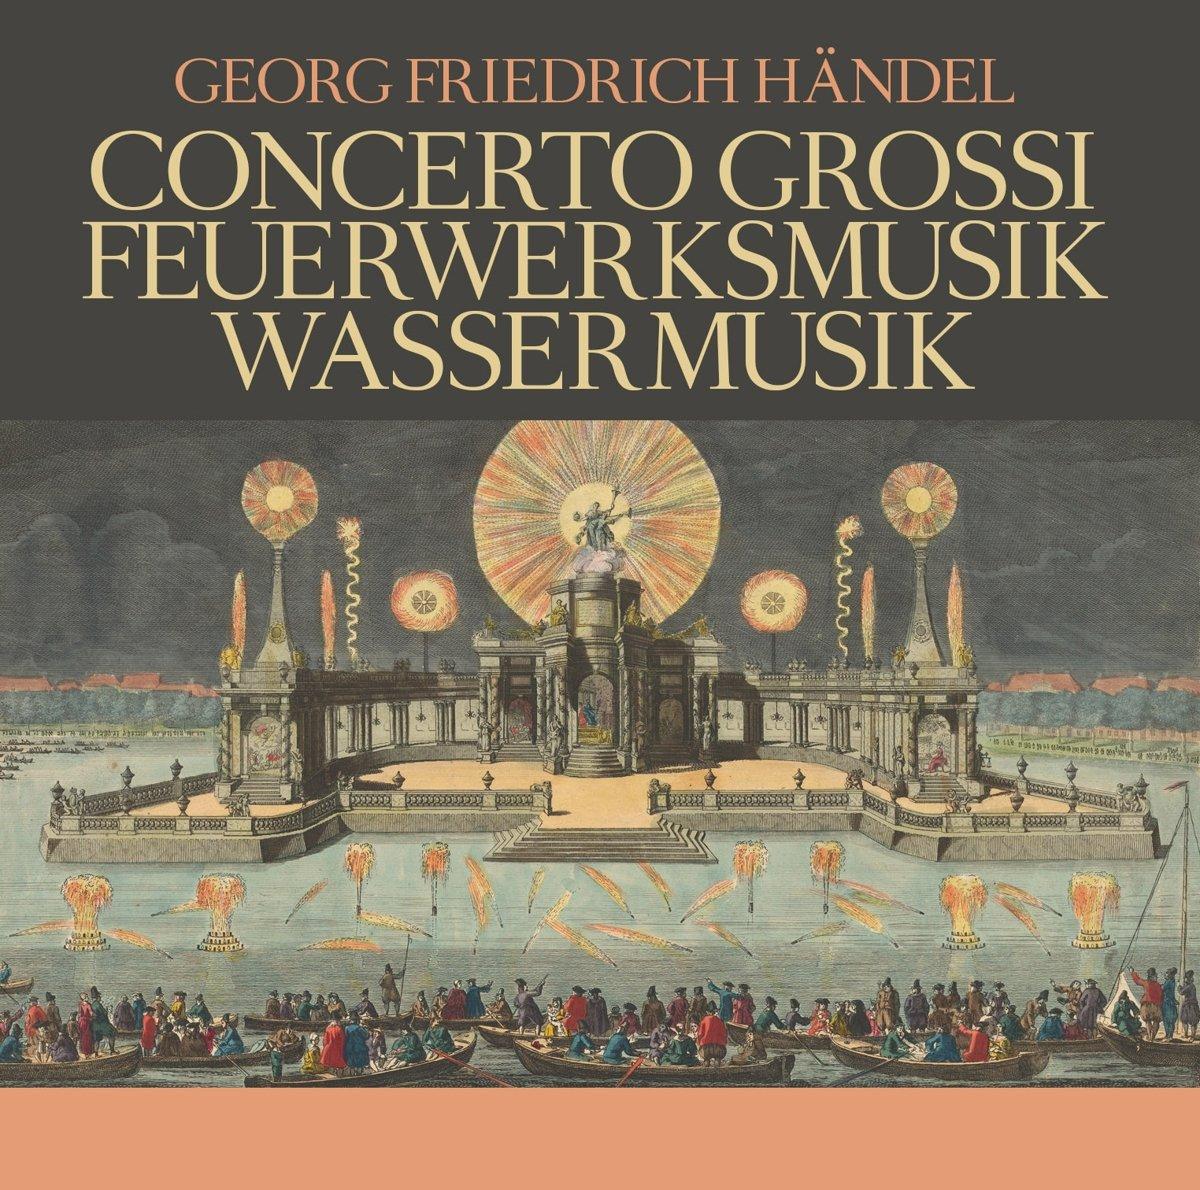 Георг Гендель Georg Friedrich Handel. Concerti Grossi, Feuerwerksmus (3 CD) julia grossi julia grossi ju011awlkq41